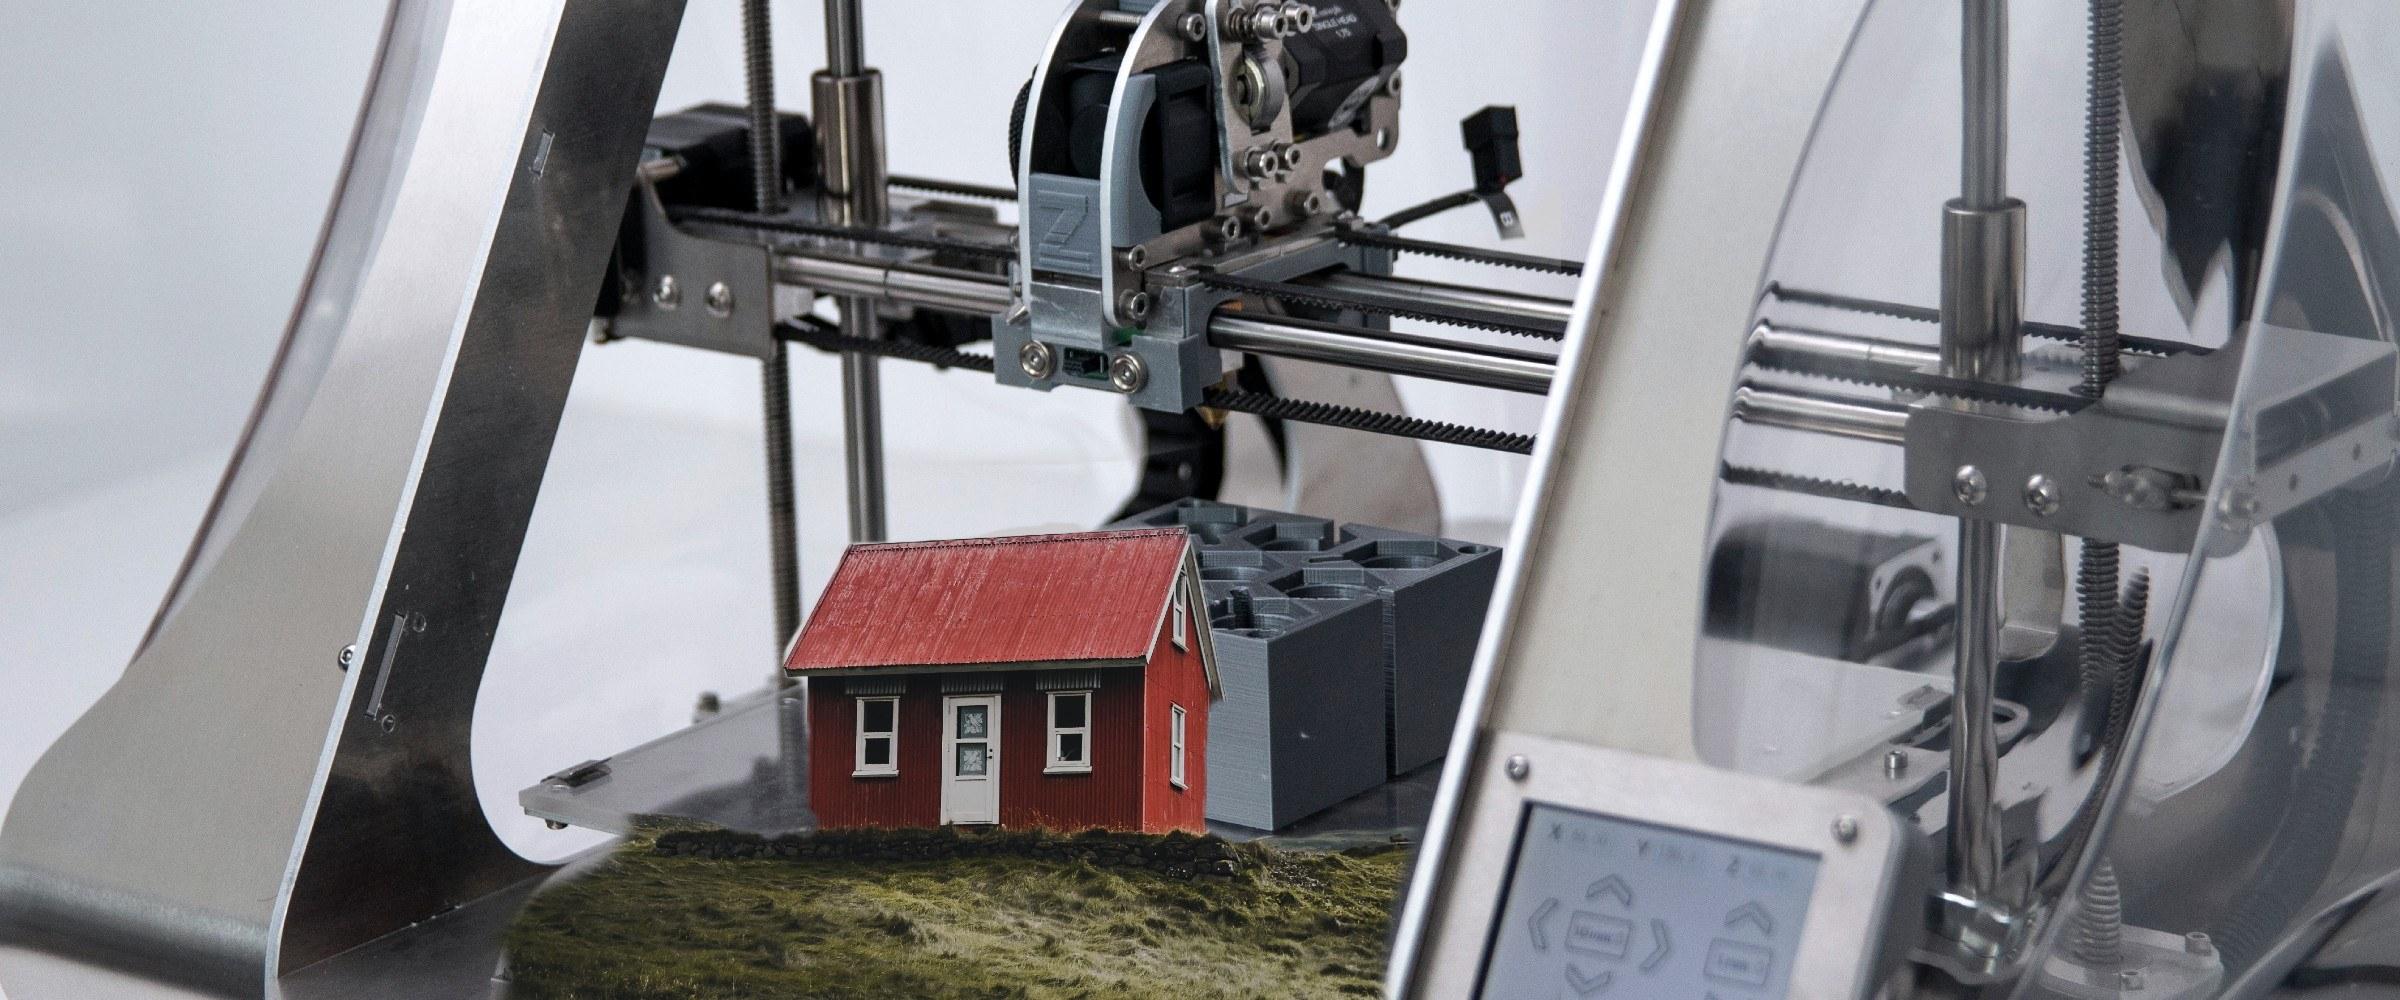 3D Printer printing a home